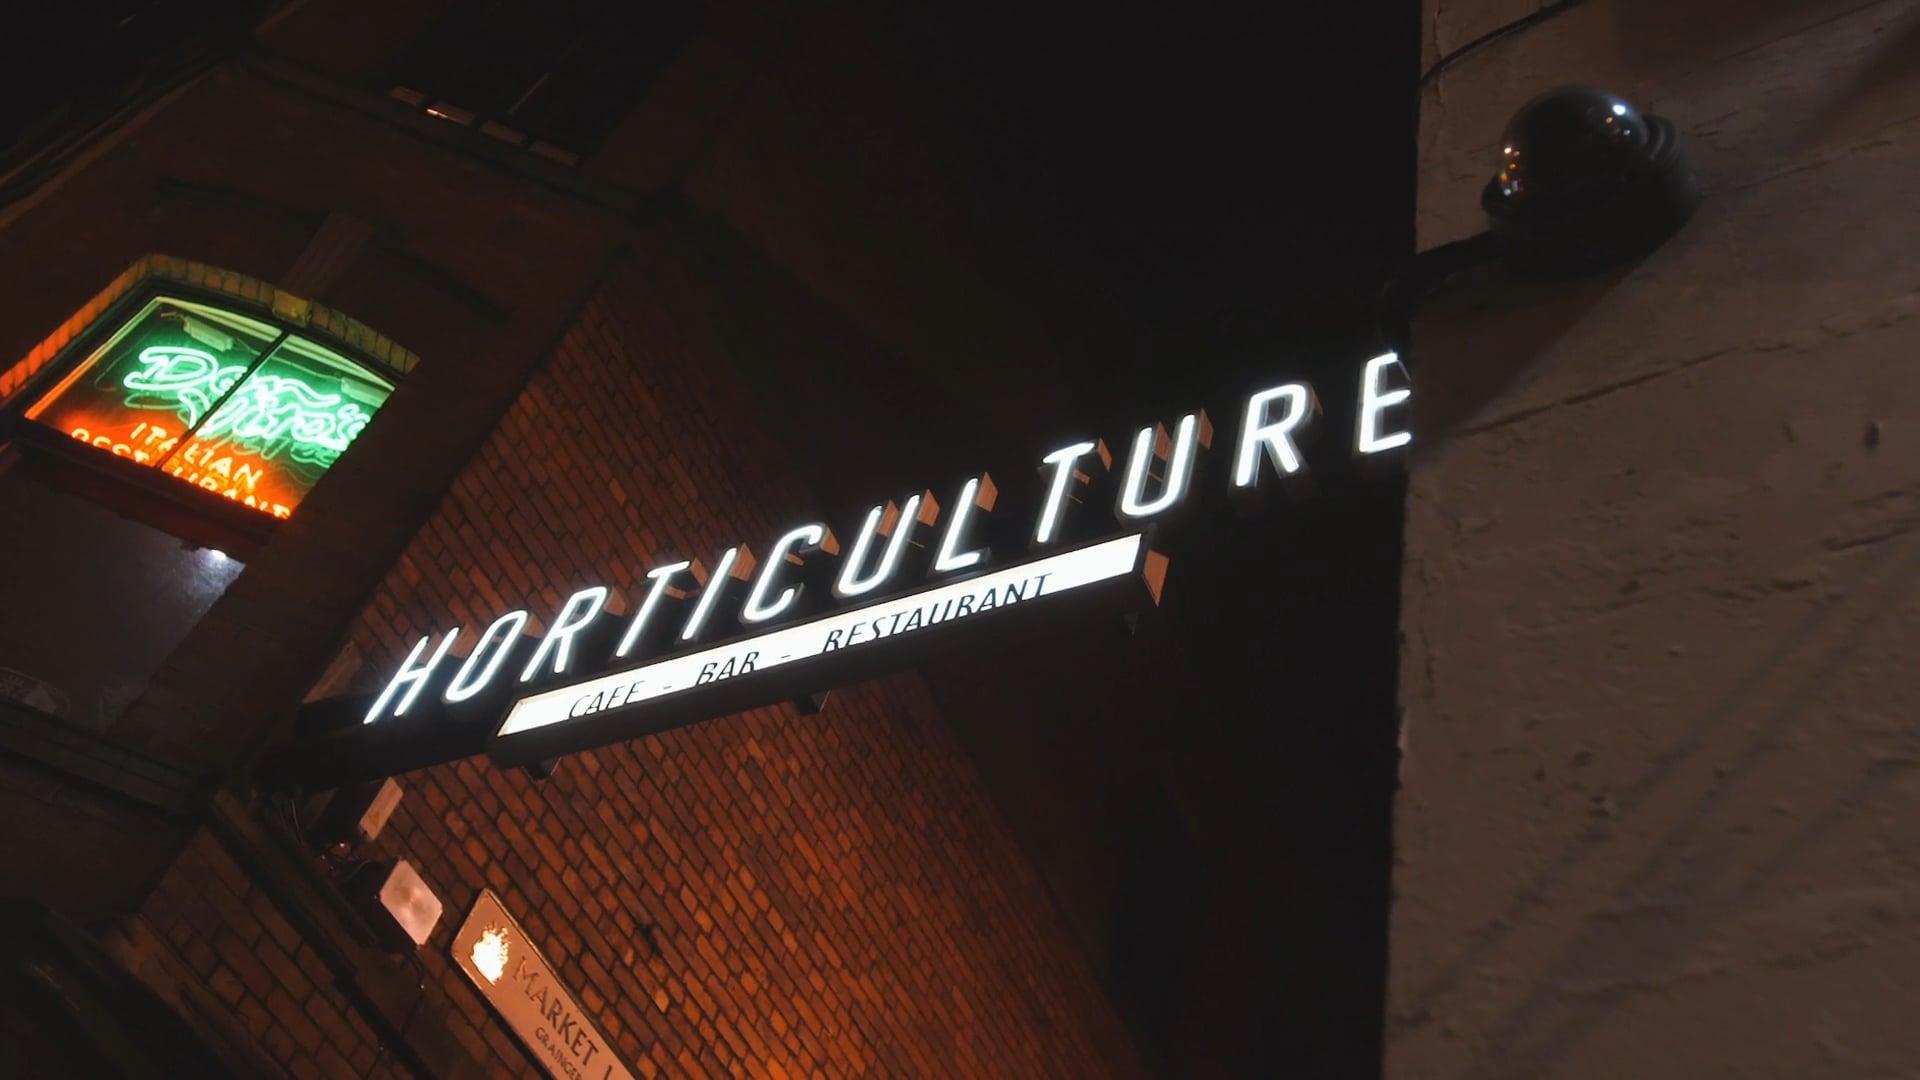 Horticulture Bar & Restaurant